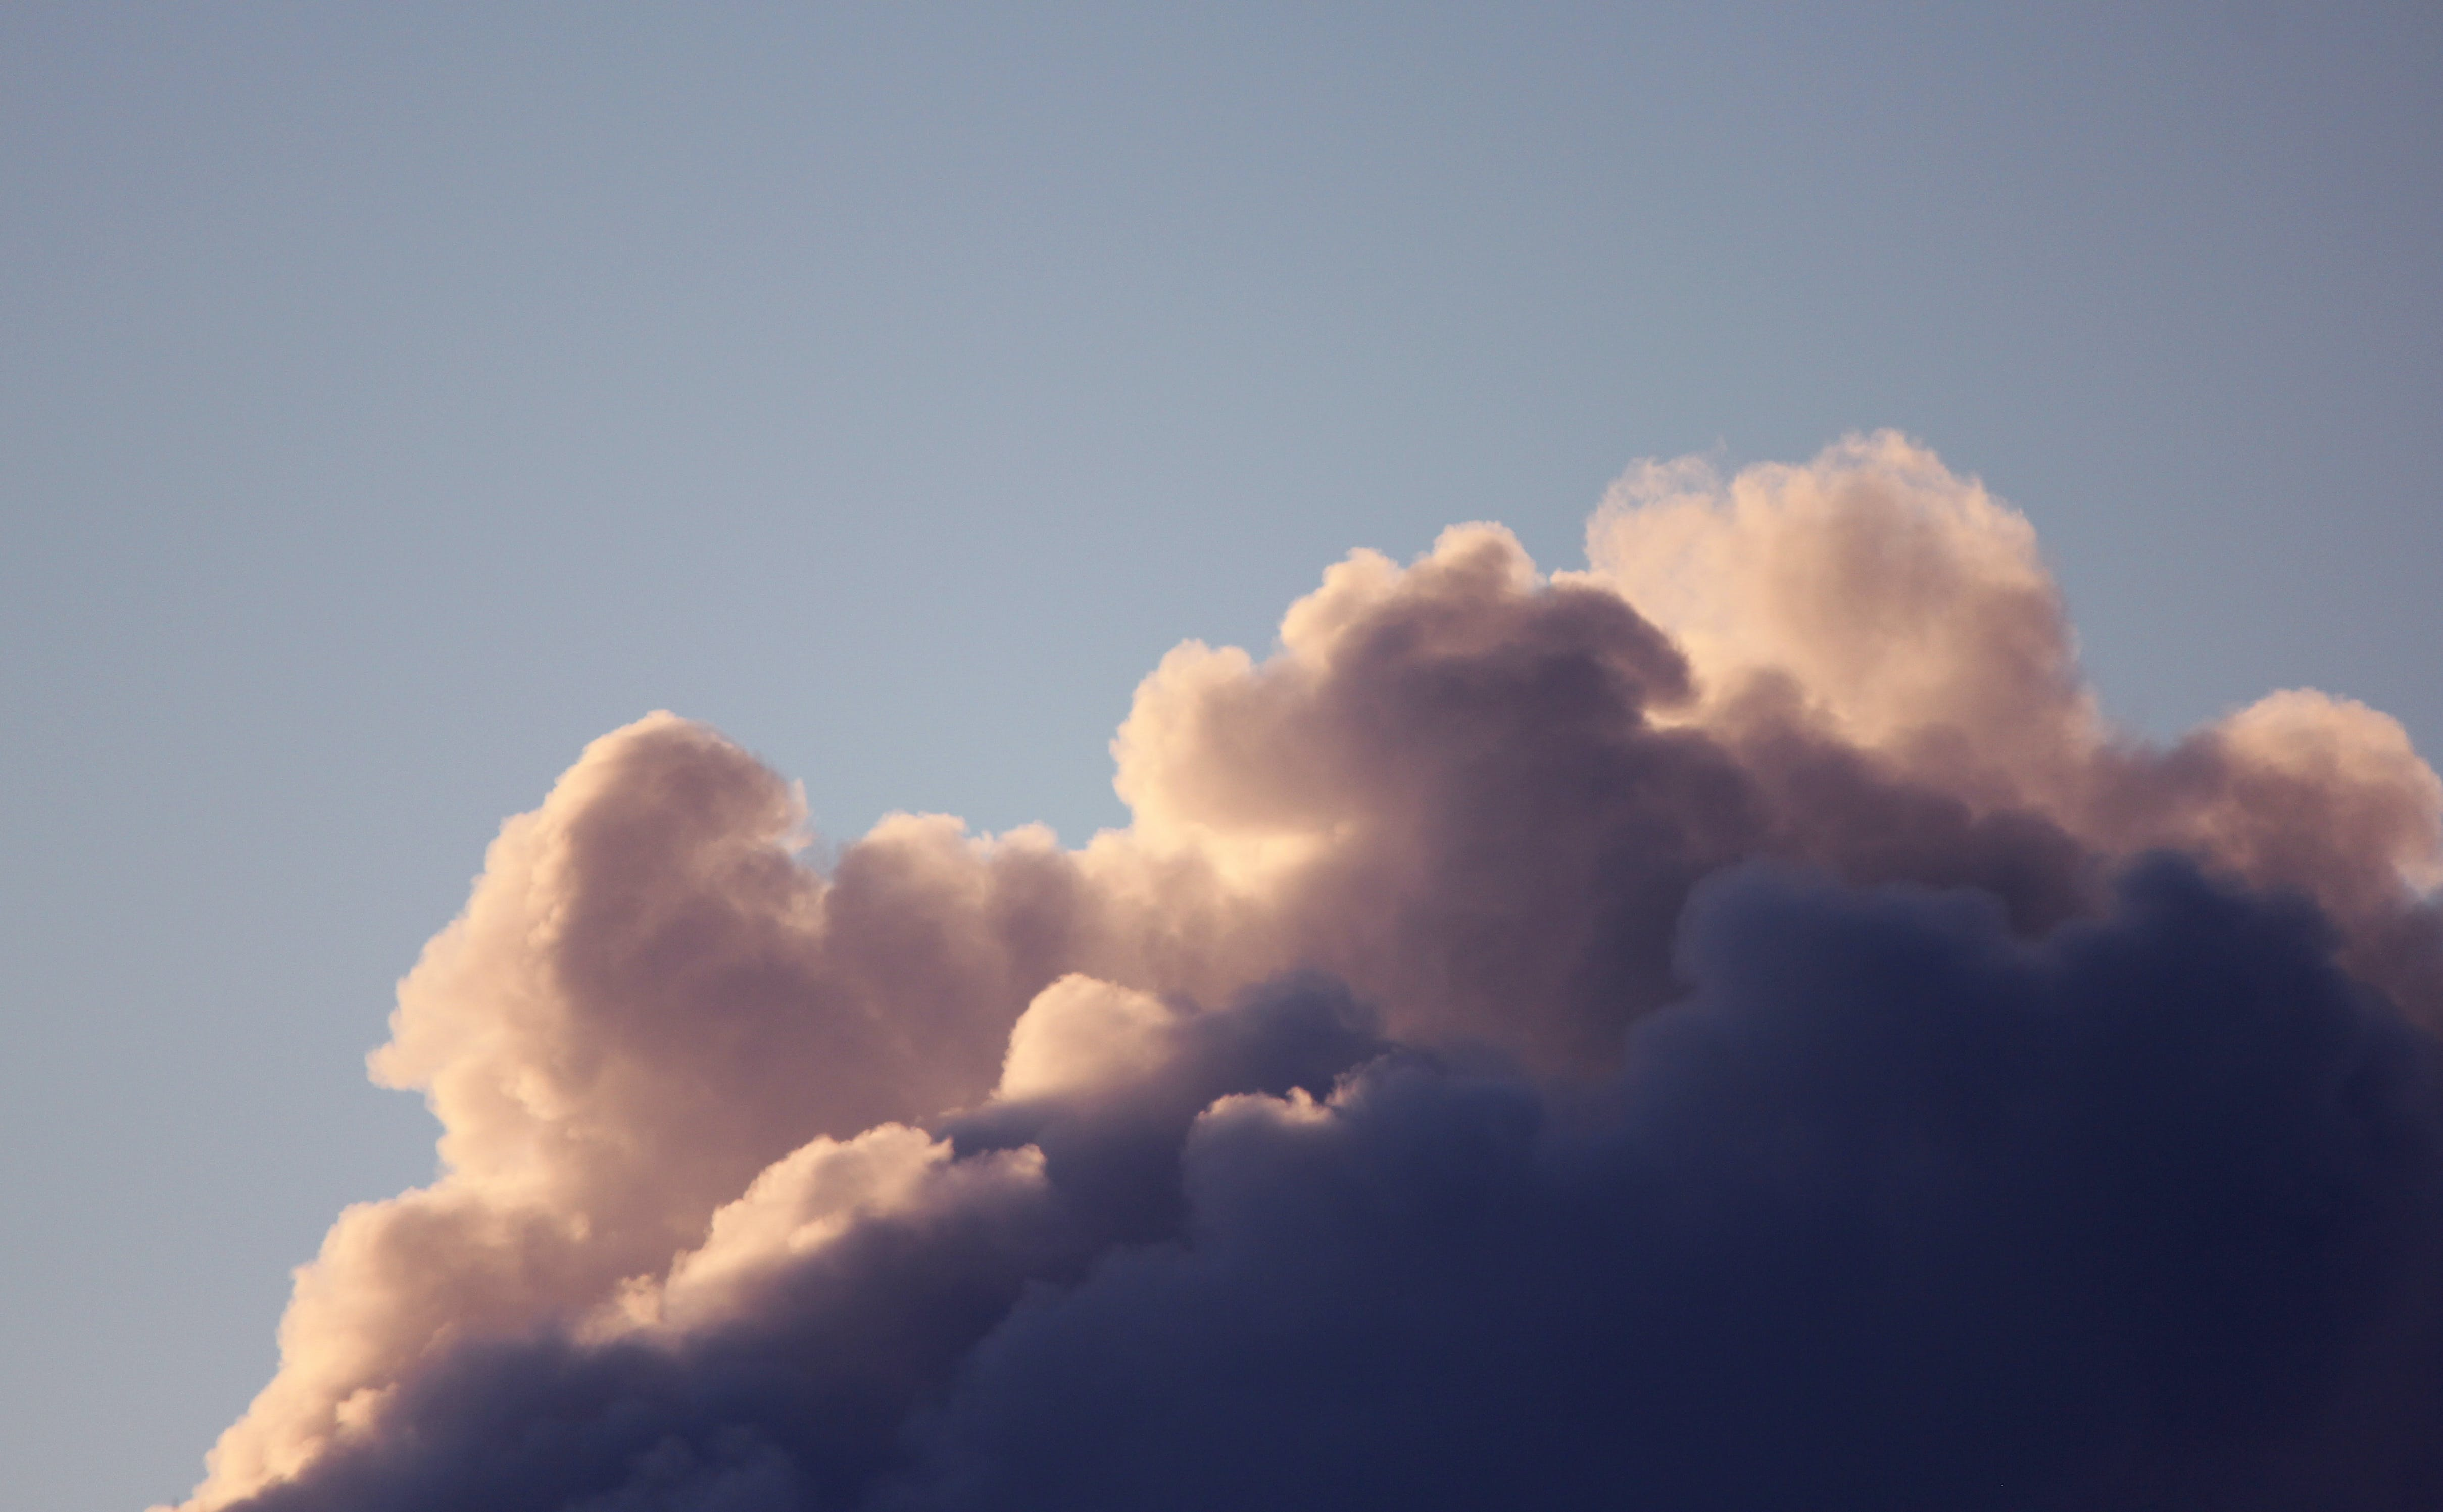 Free stock photo of blue sky, clouds, cumulus